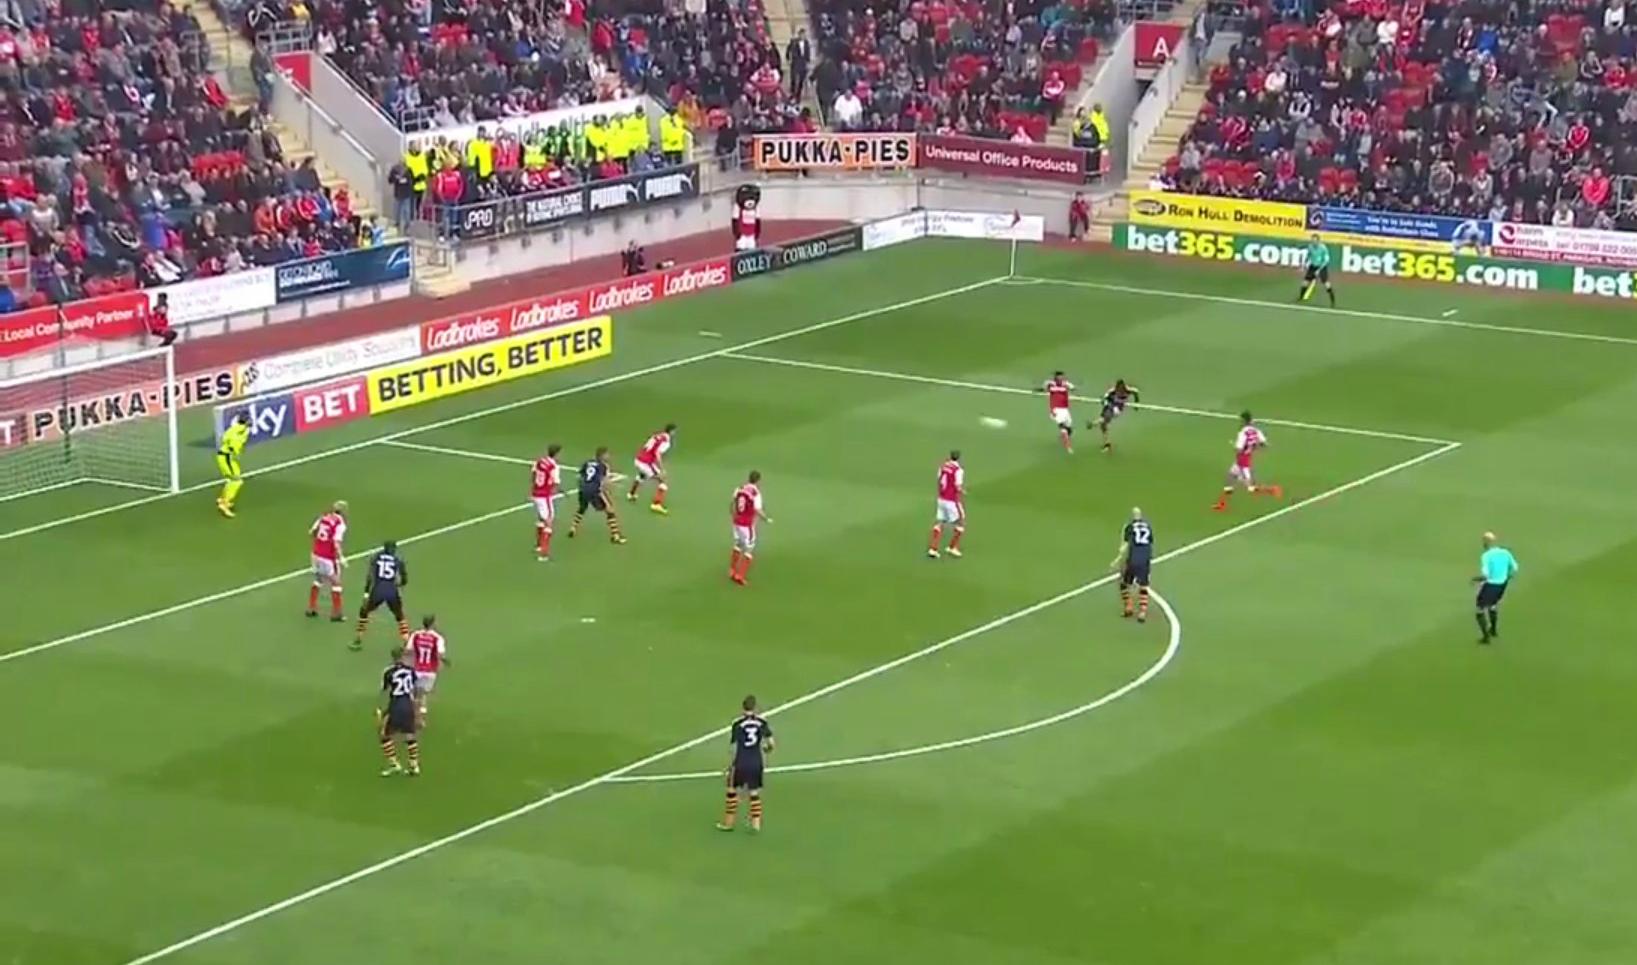 Chelsea loanee Christian Atsu scores brilliant goal to help Newcastle United defeat Rotherham